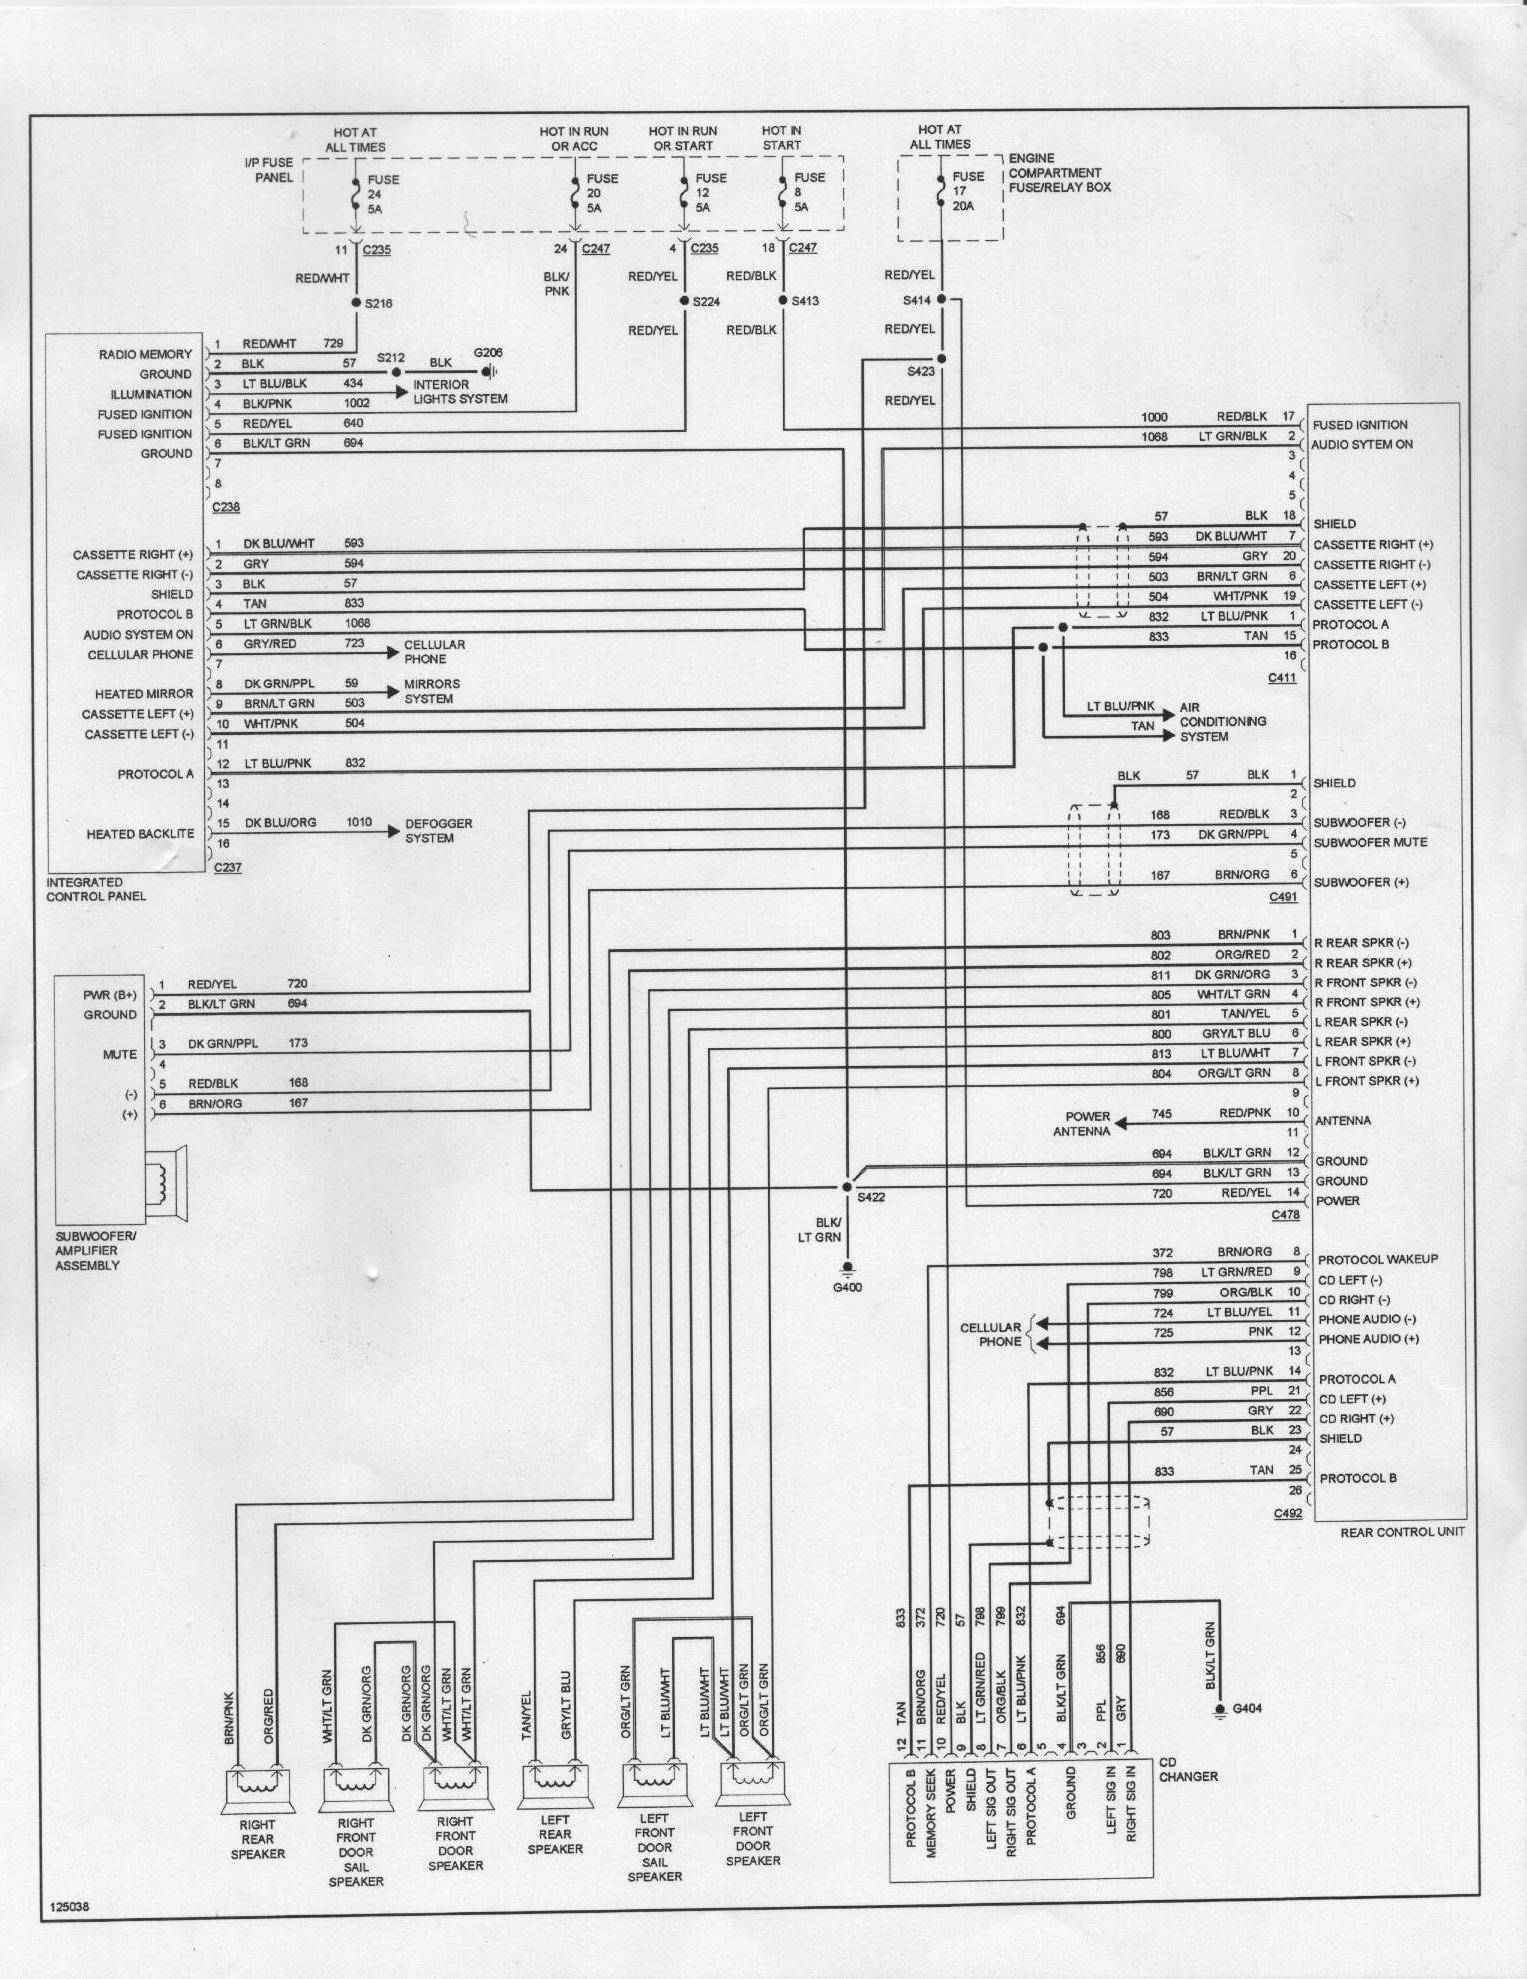 [DIAGRAM_5NL]  RX_9965] Wiring Harness Scosche Radio Wiring Harness Wiring Harness Wiring  Wiring Diagram | Scosche Wiring Harness Diagram 2006 Ford Mustang |  | Hete Ospor Hist Mecad Gho Emba Mohammedshrine Librar Wiring 101